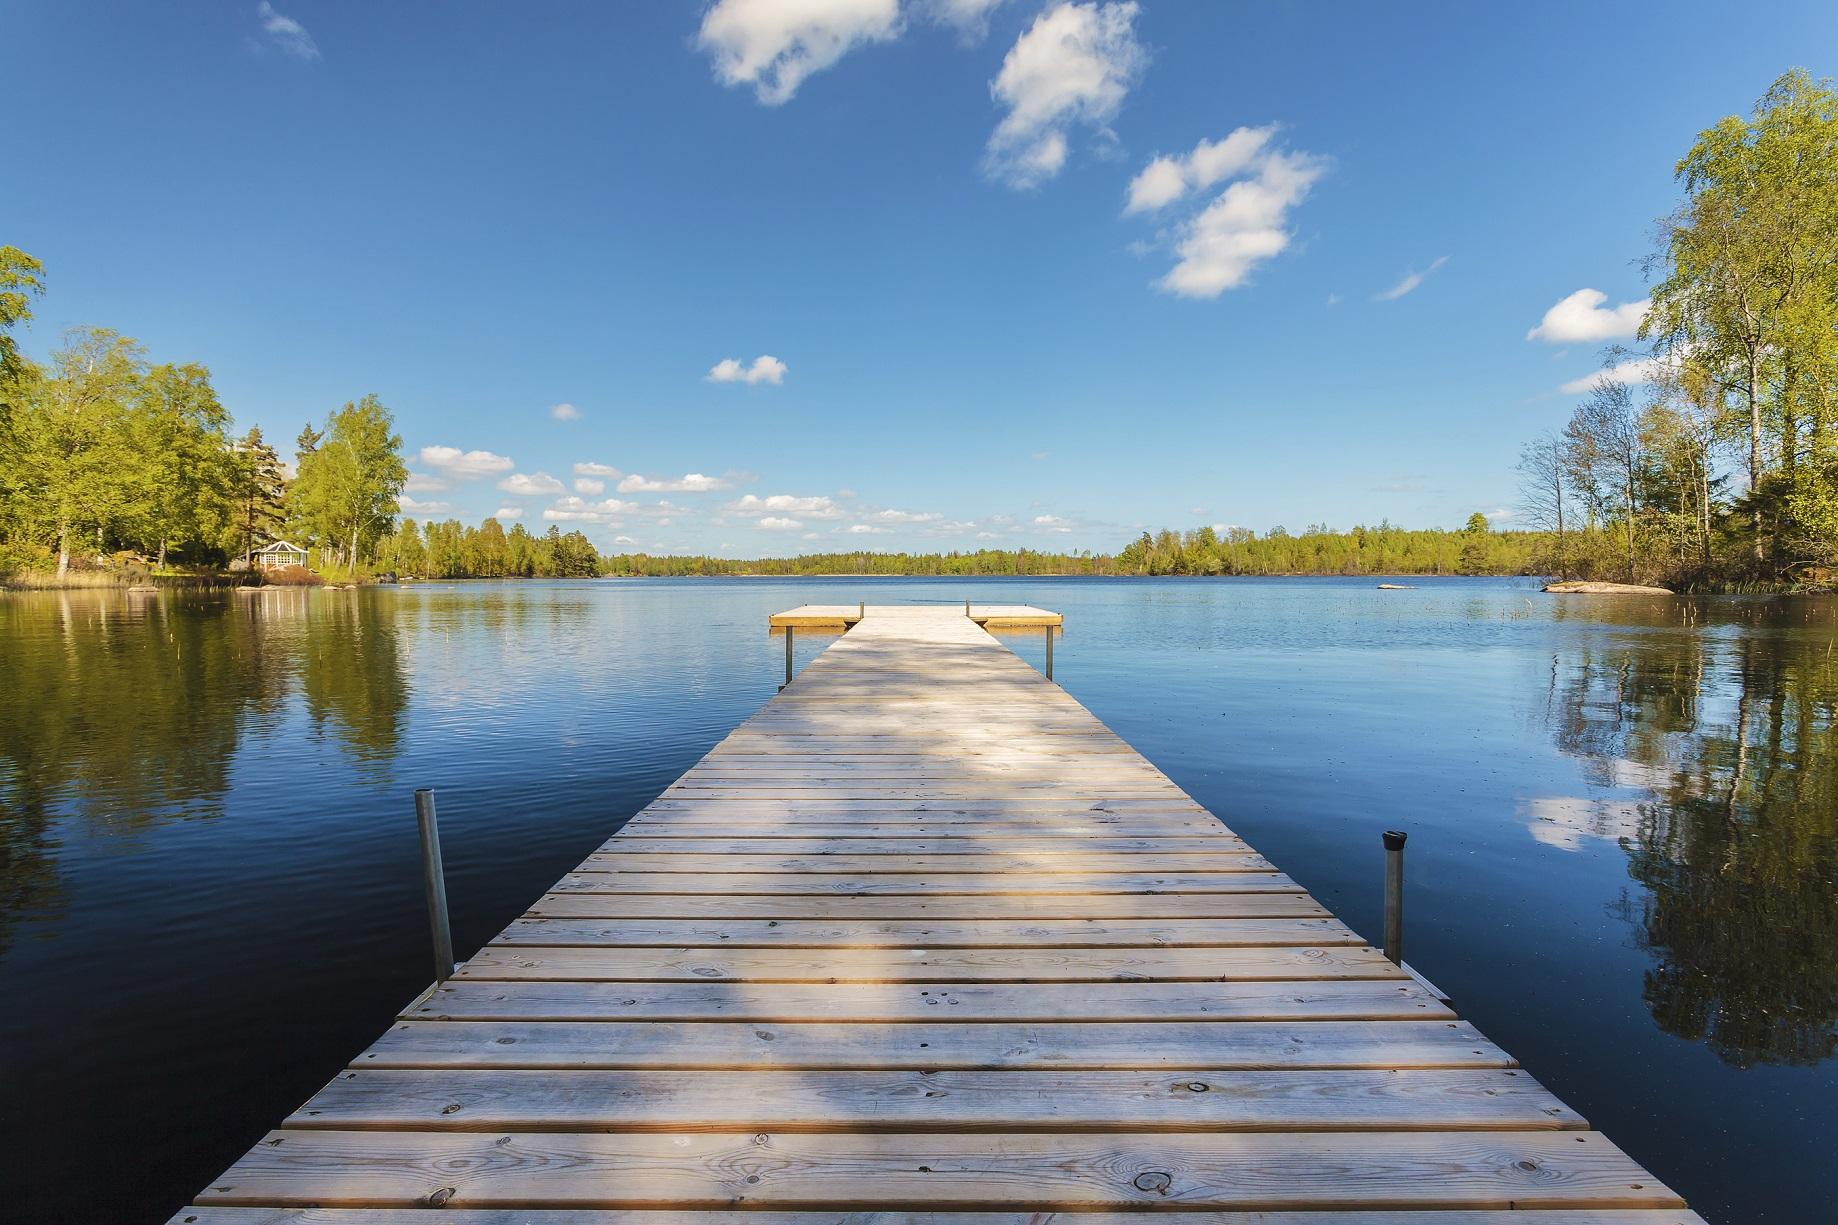 sunny lake day